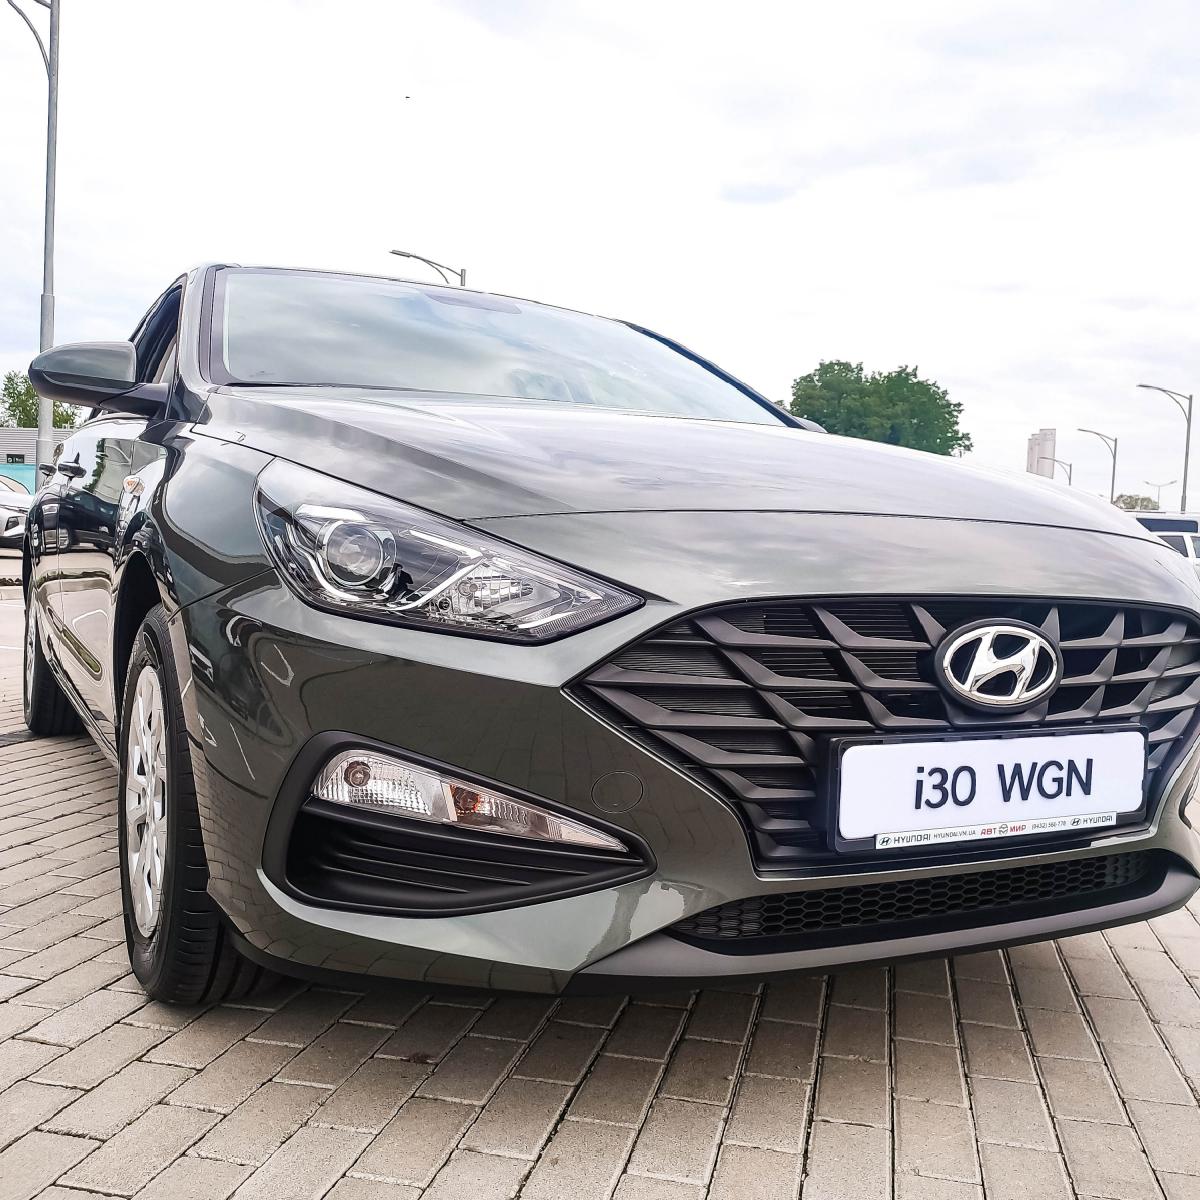 Спеціальна вигода на придбання Hyundai i30 WGN! | Хюндай Мотор Україна - фото 7